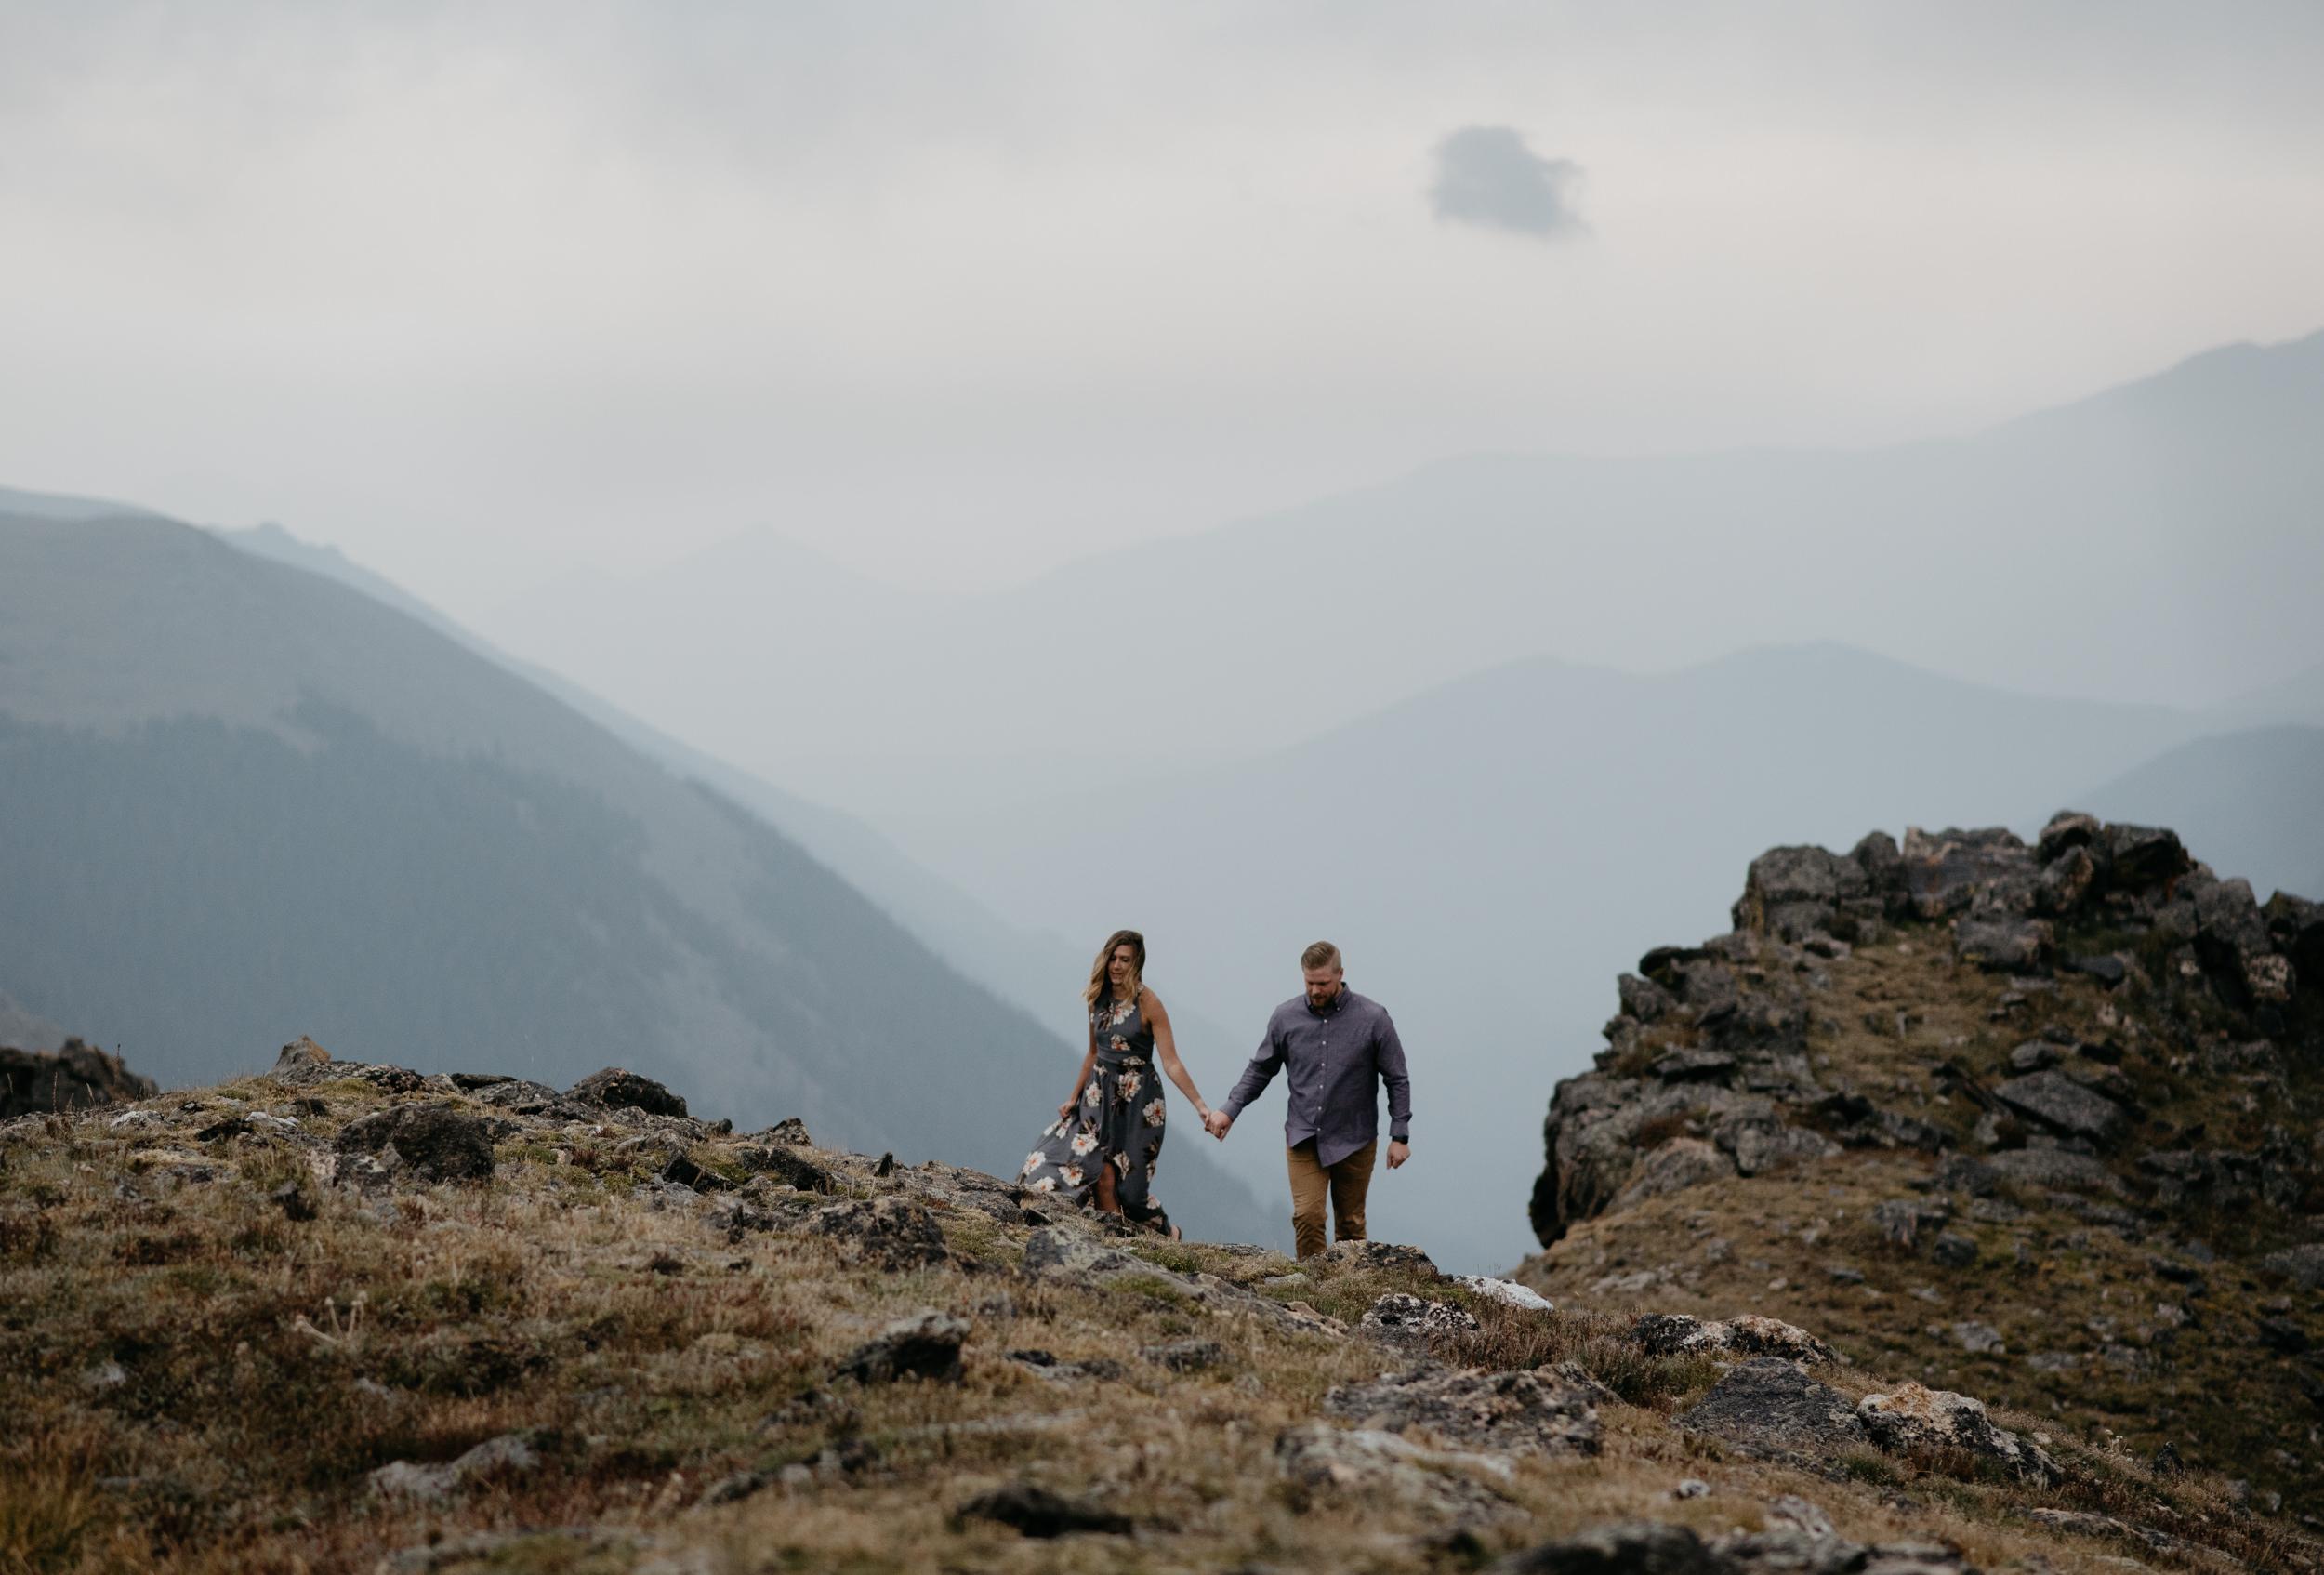 Rocky Mountain National Park adventure elopement photographer. Colorado wedding photographer.